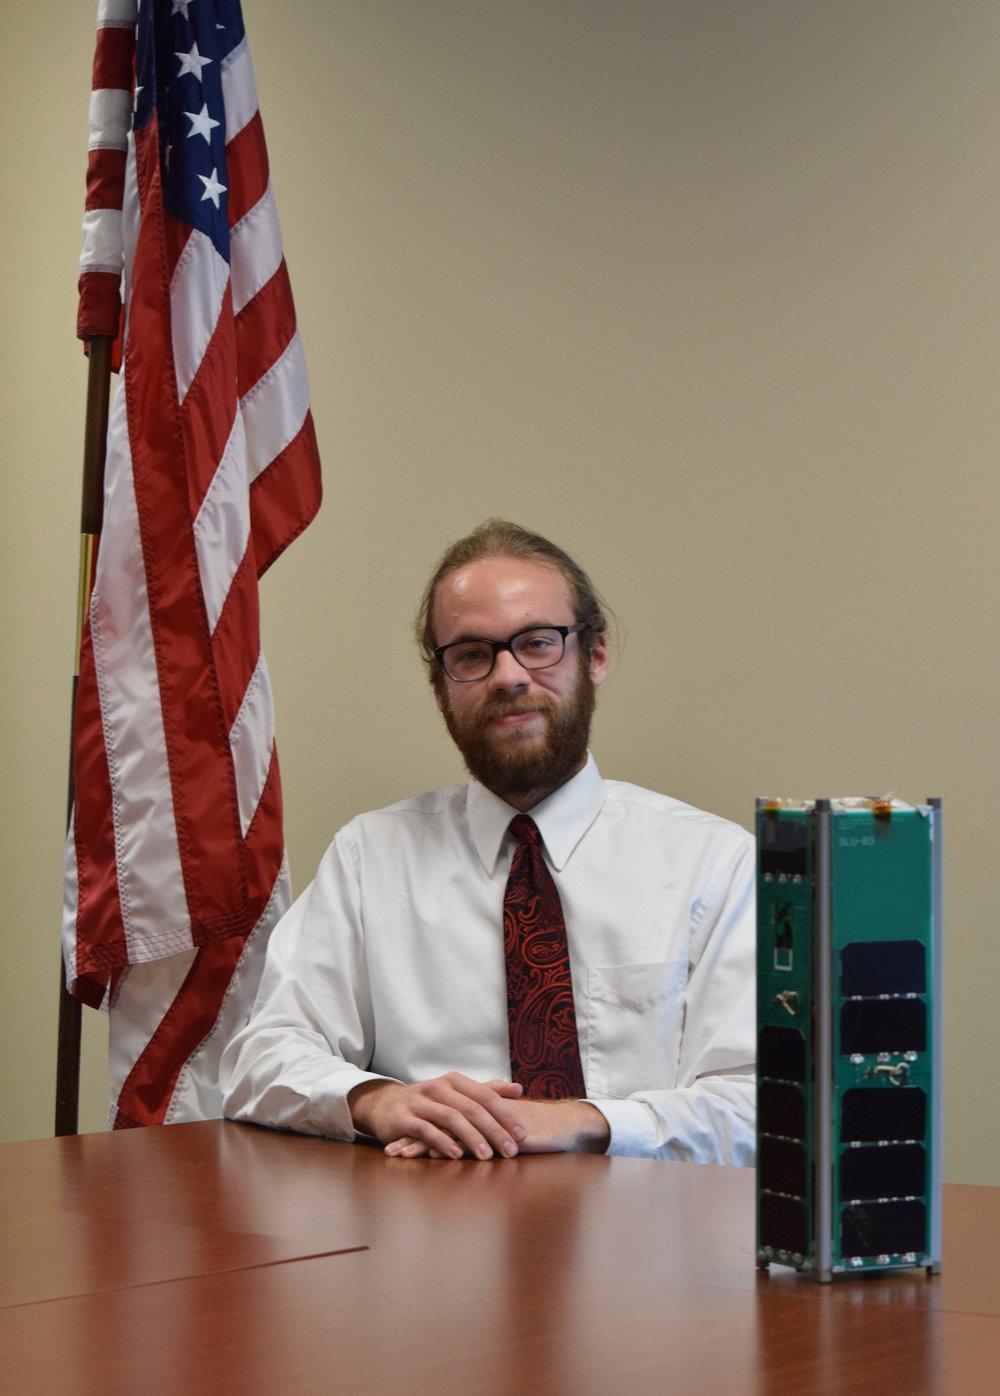 Daniel Reczek  - Propolsion Subsystem Lead